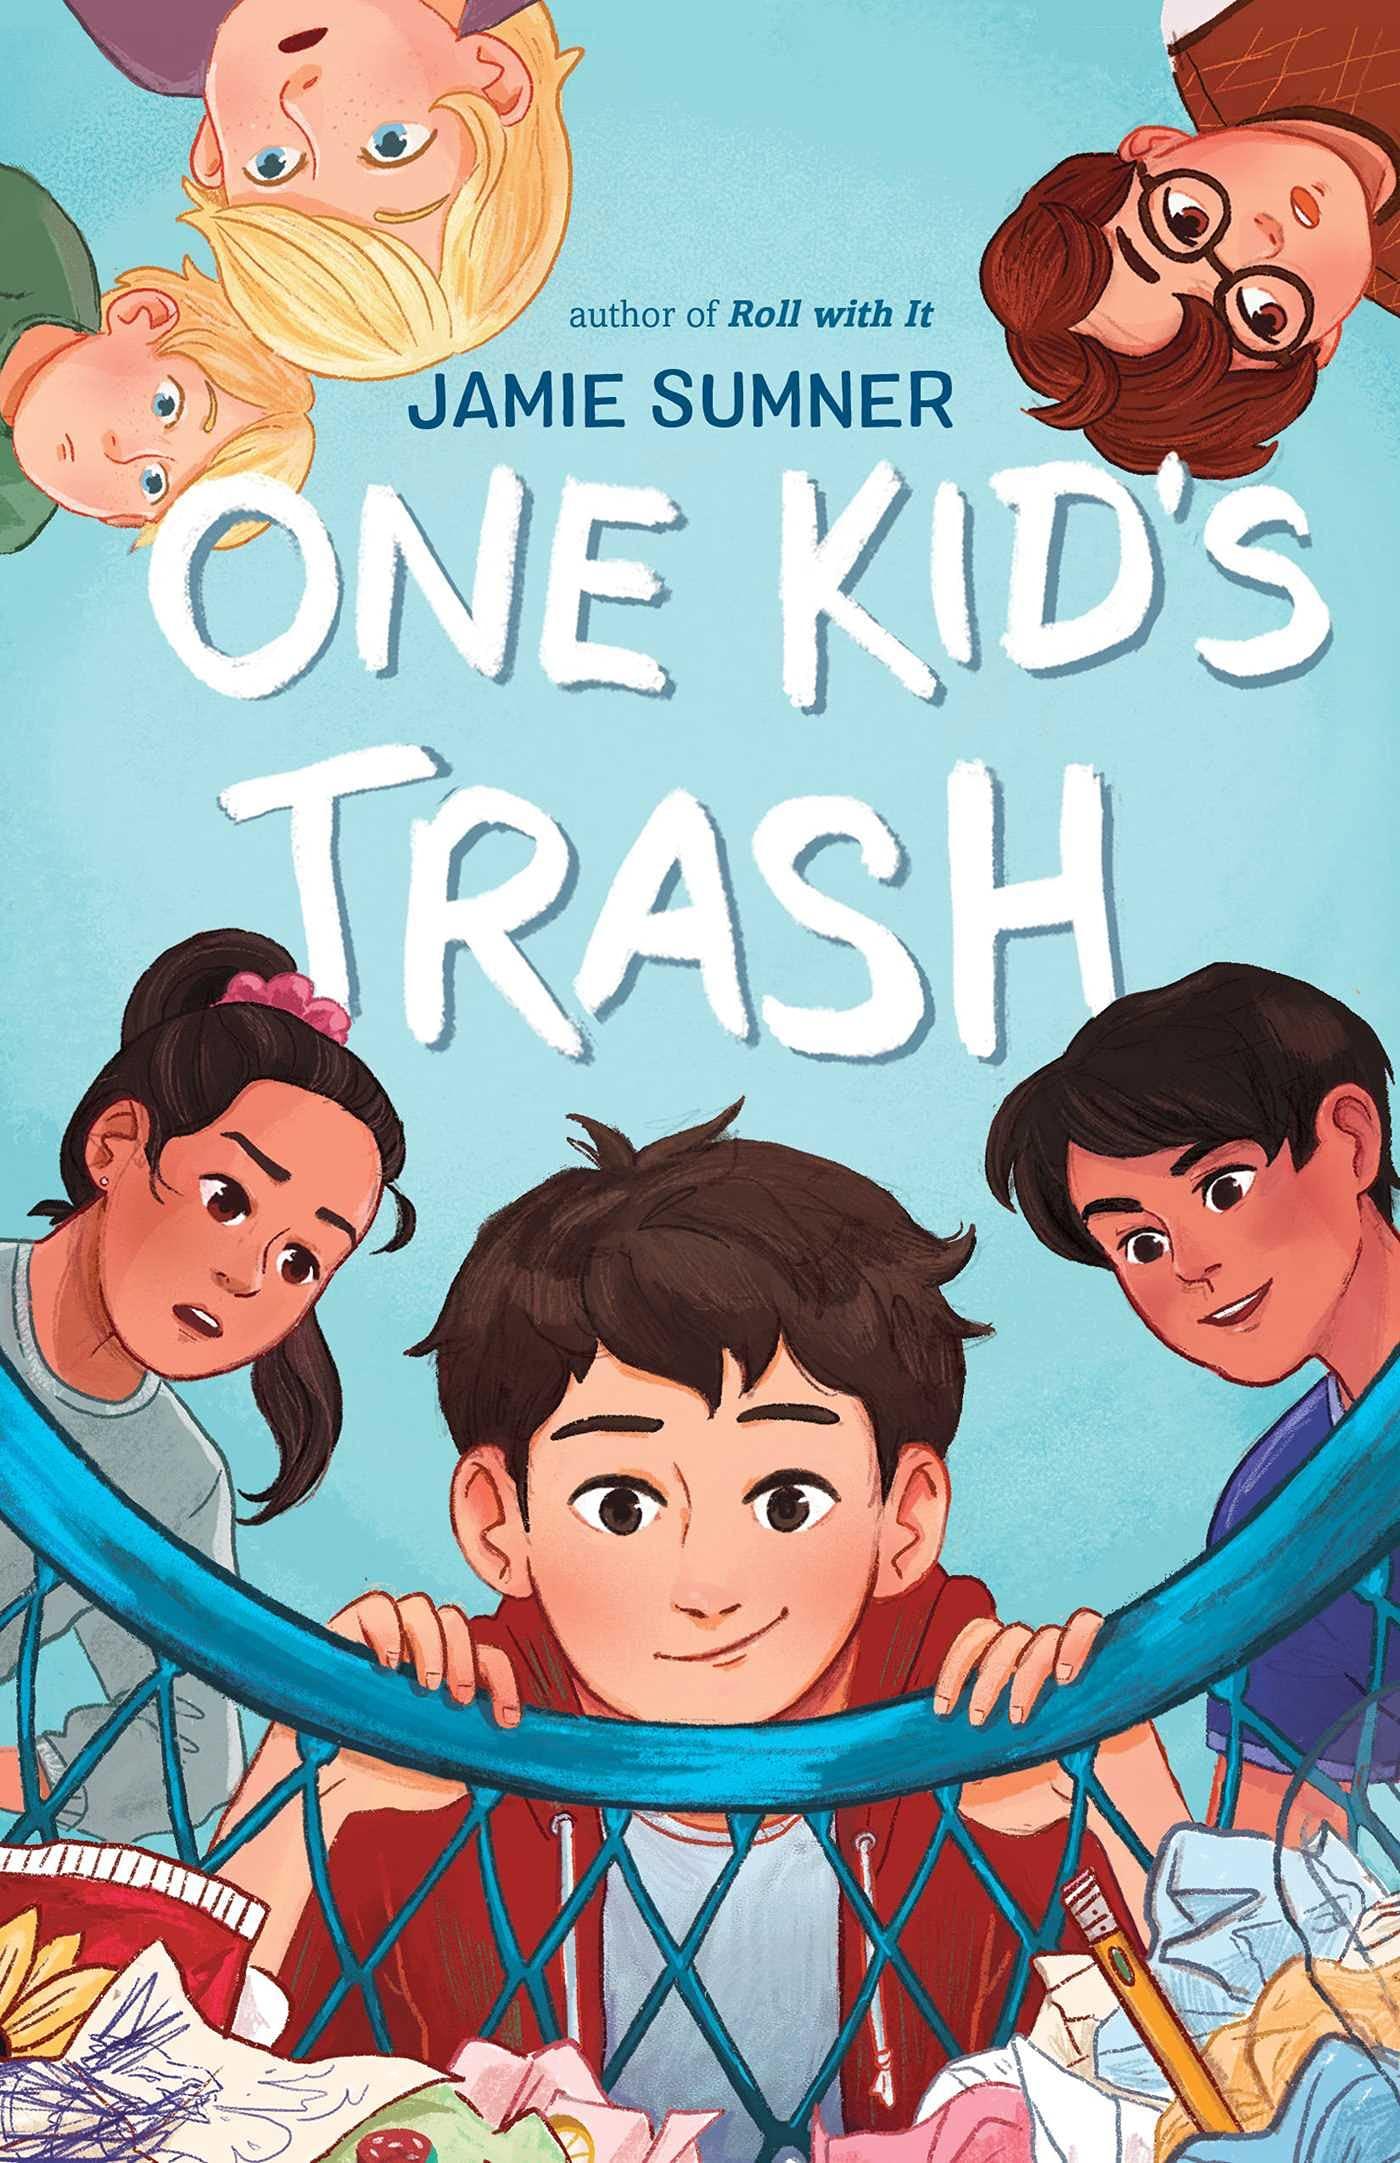 One Kid's Trash: Sumner, Jamie: 9781534457034: Amazon.com: Books